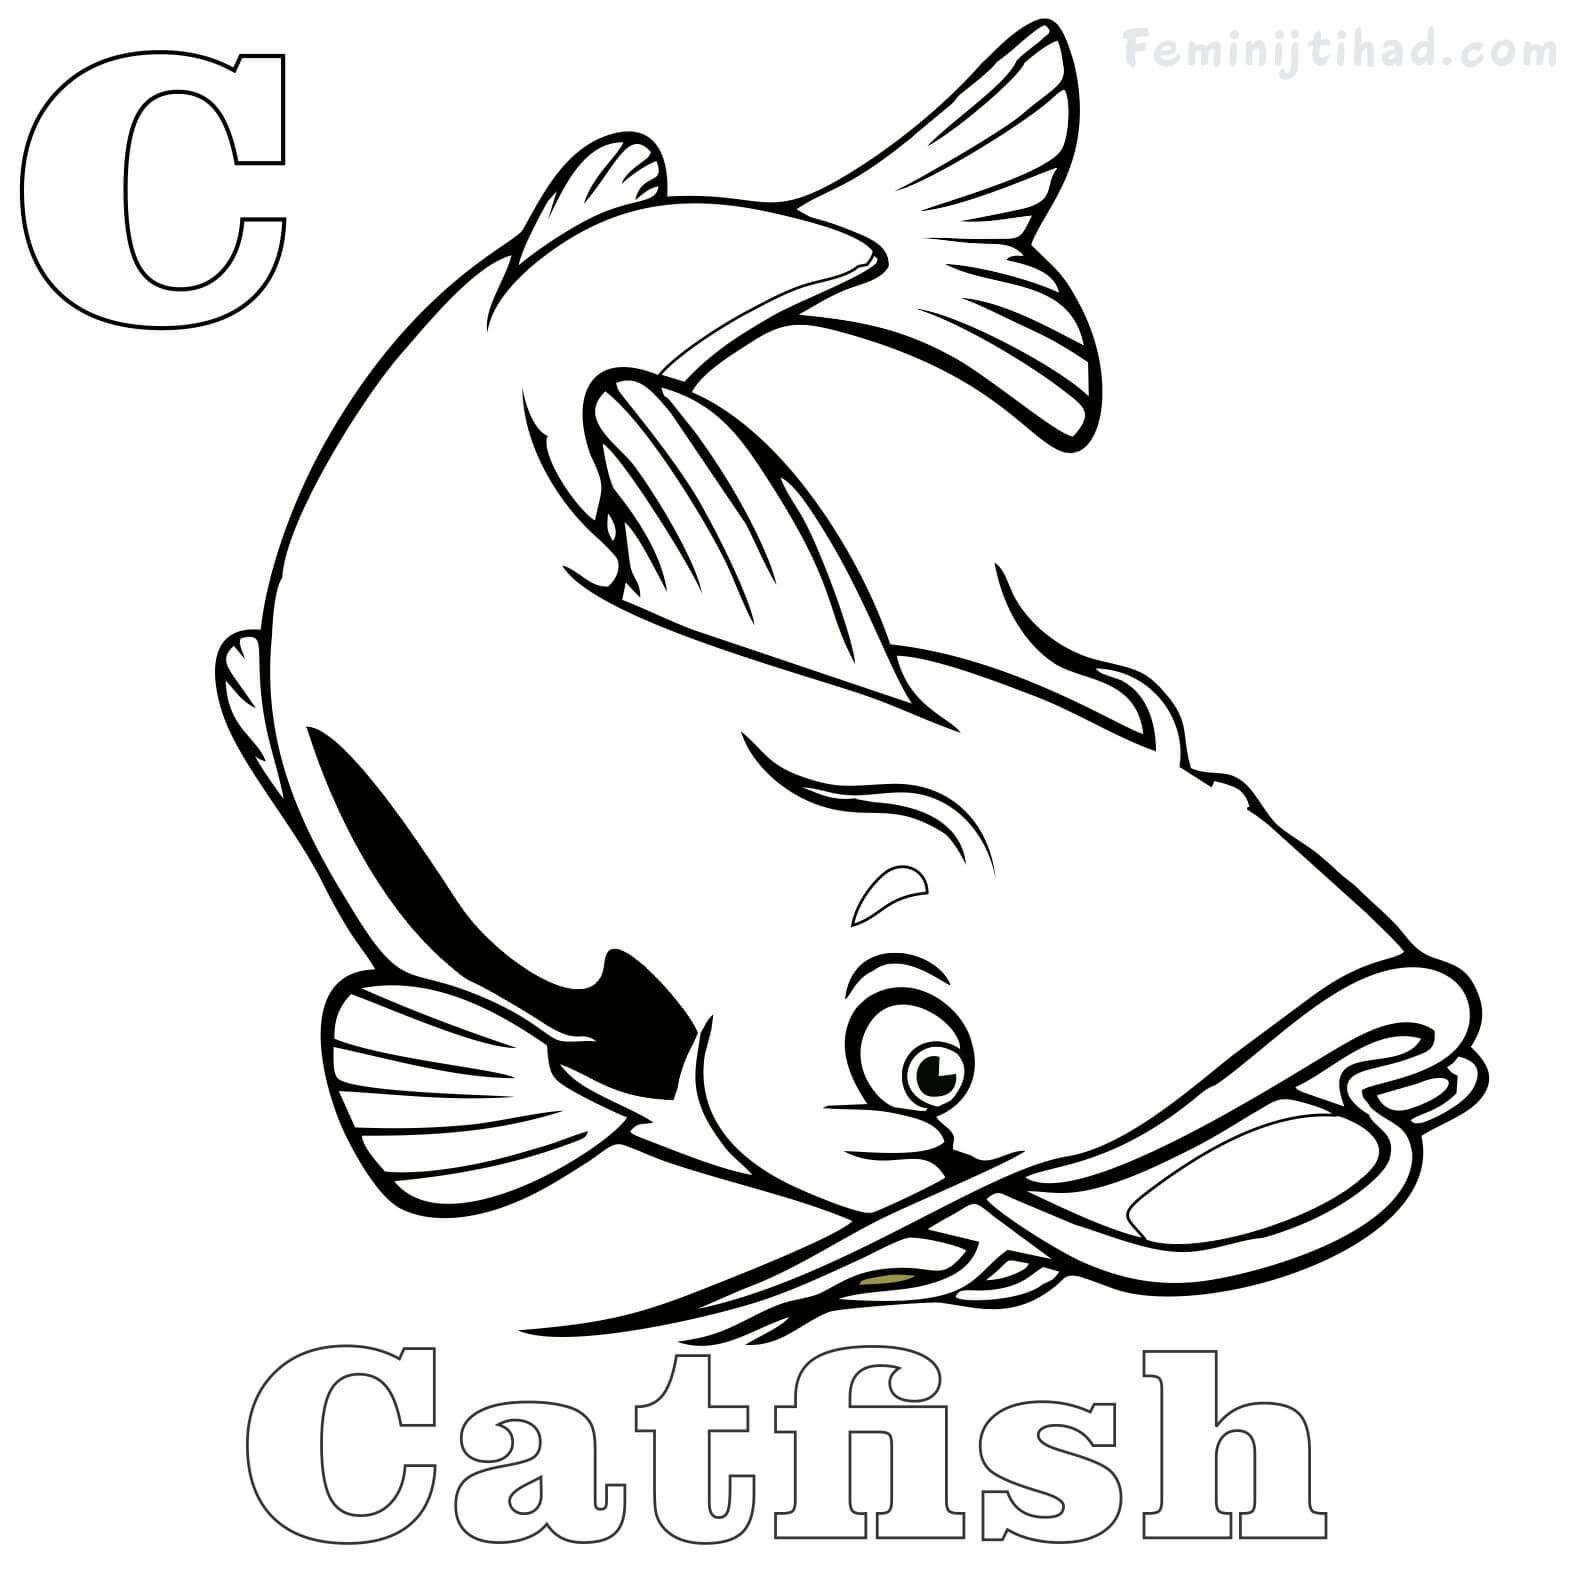 Catfish Coloring Pages Printable Free Pdf Free Coloring Sheets Animal Coloring Pages Coloring Pages Catfish